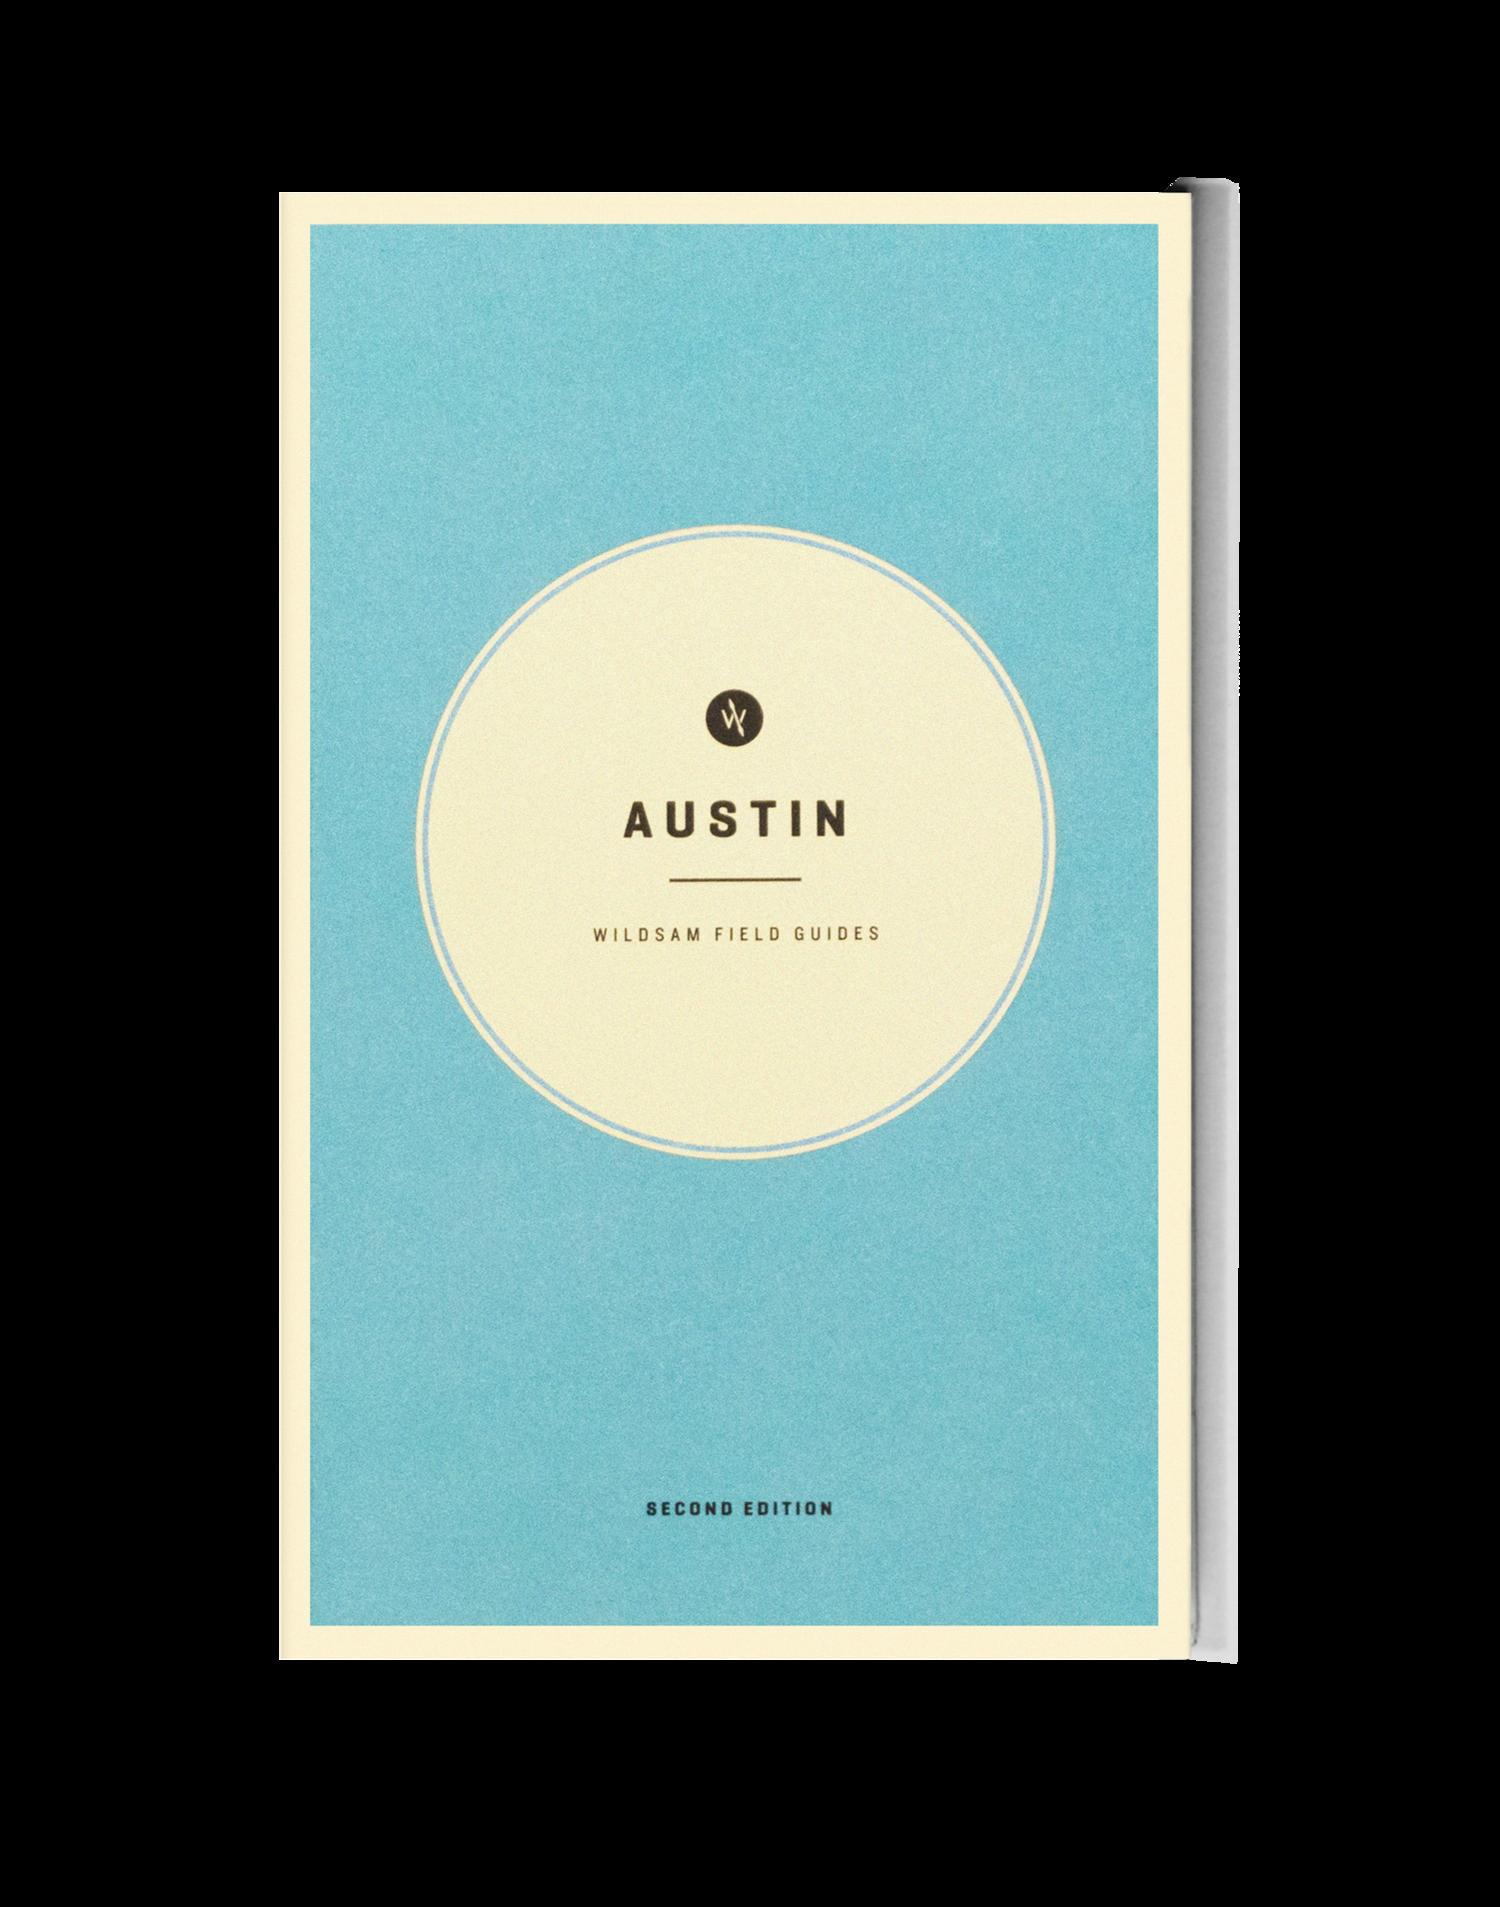 wildsam field guides austin american city guide series